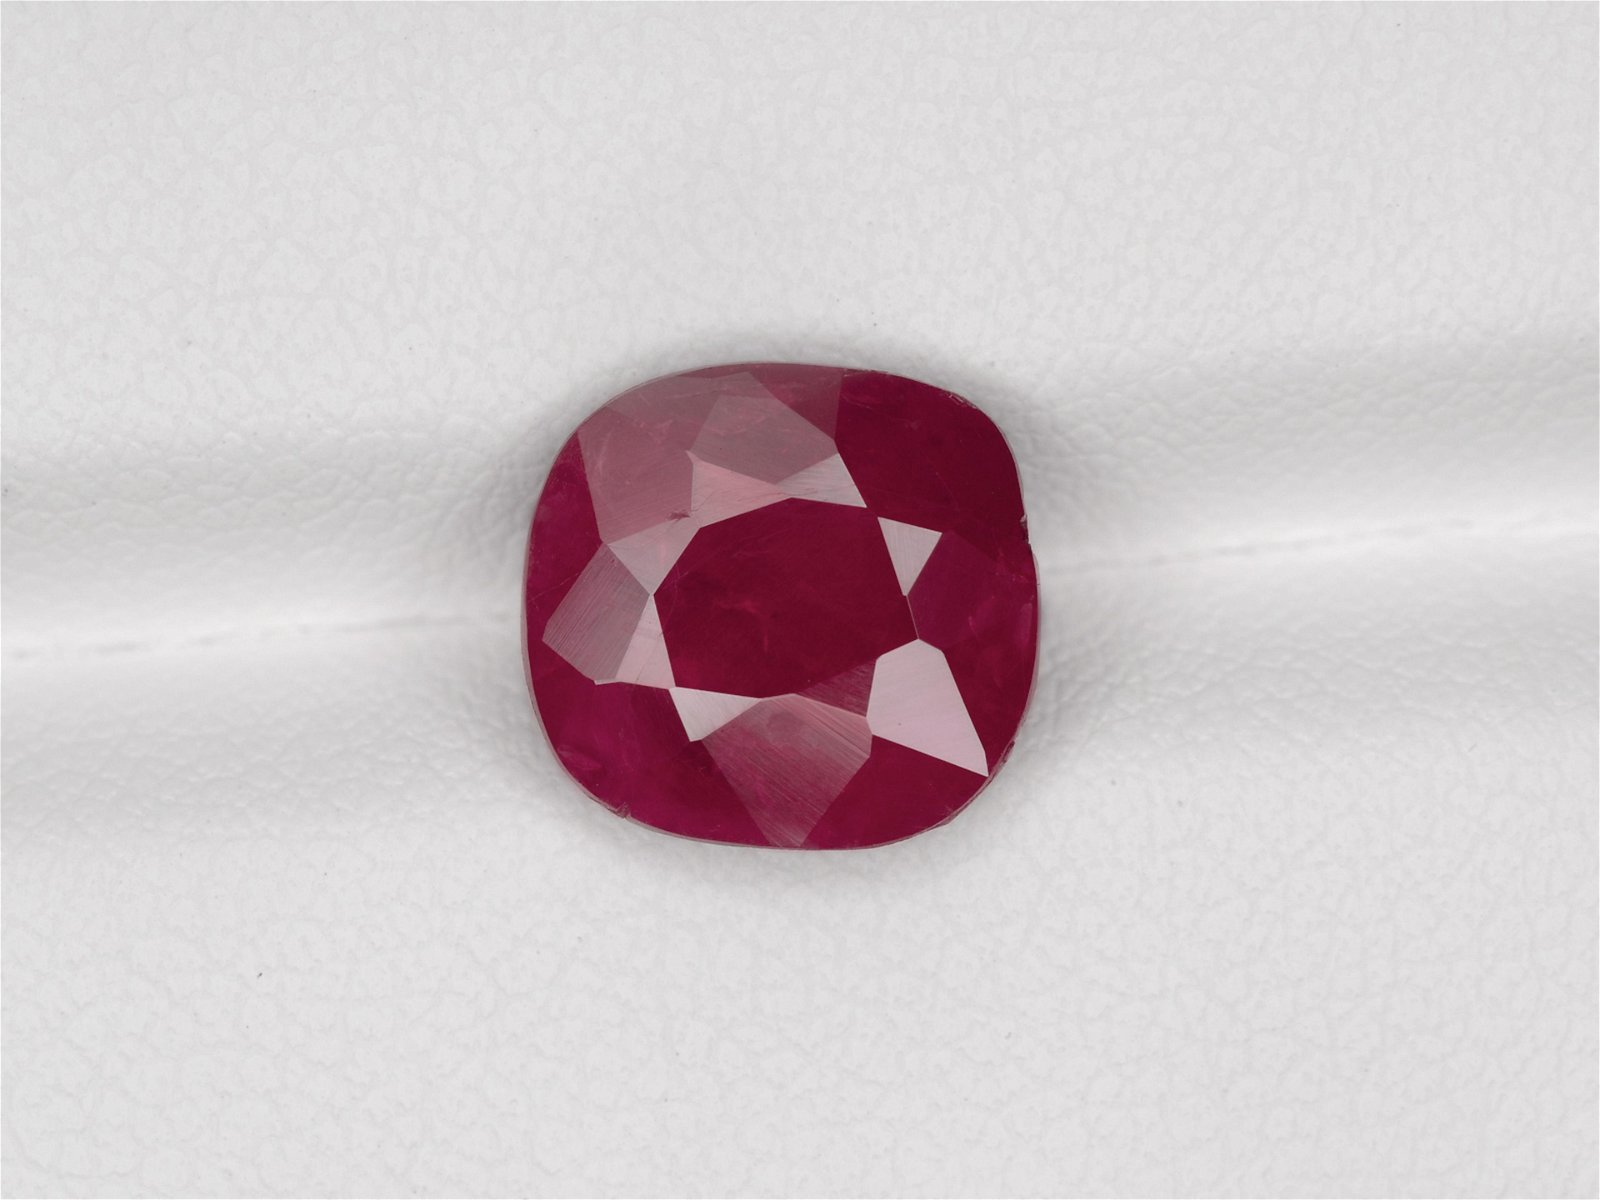 Ruby, 4.03ct, Mined in Burma, Certified by GRS